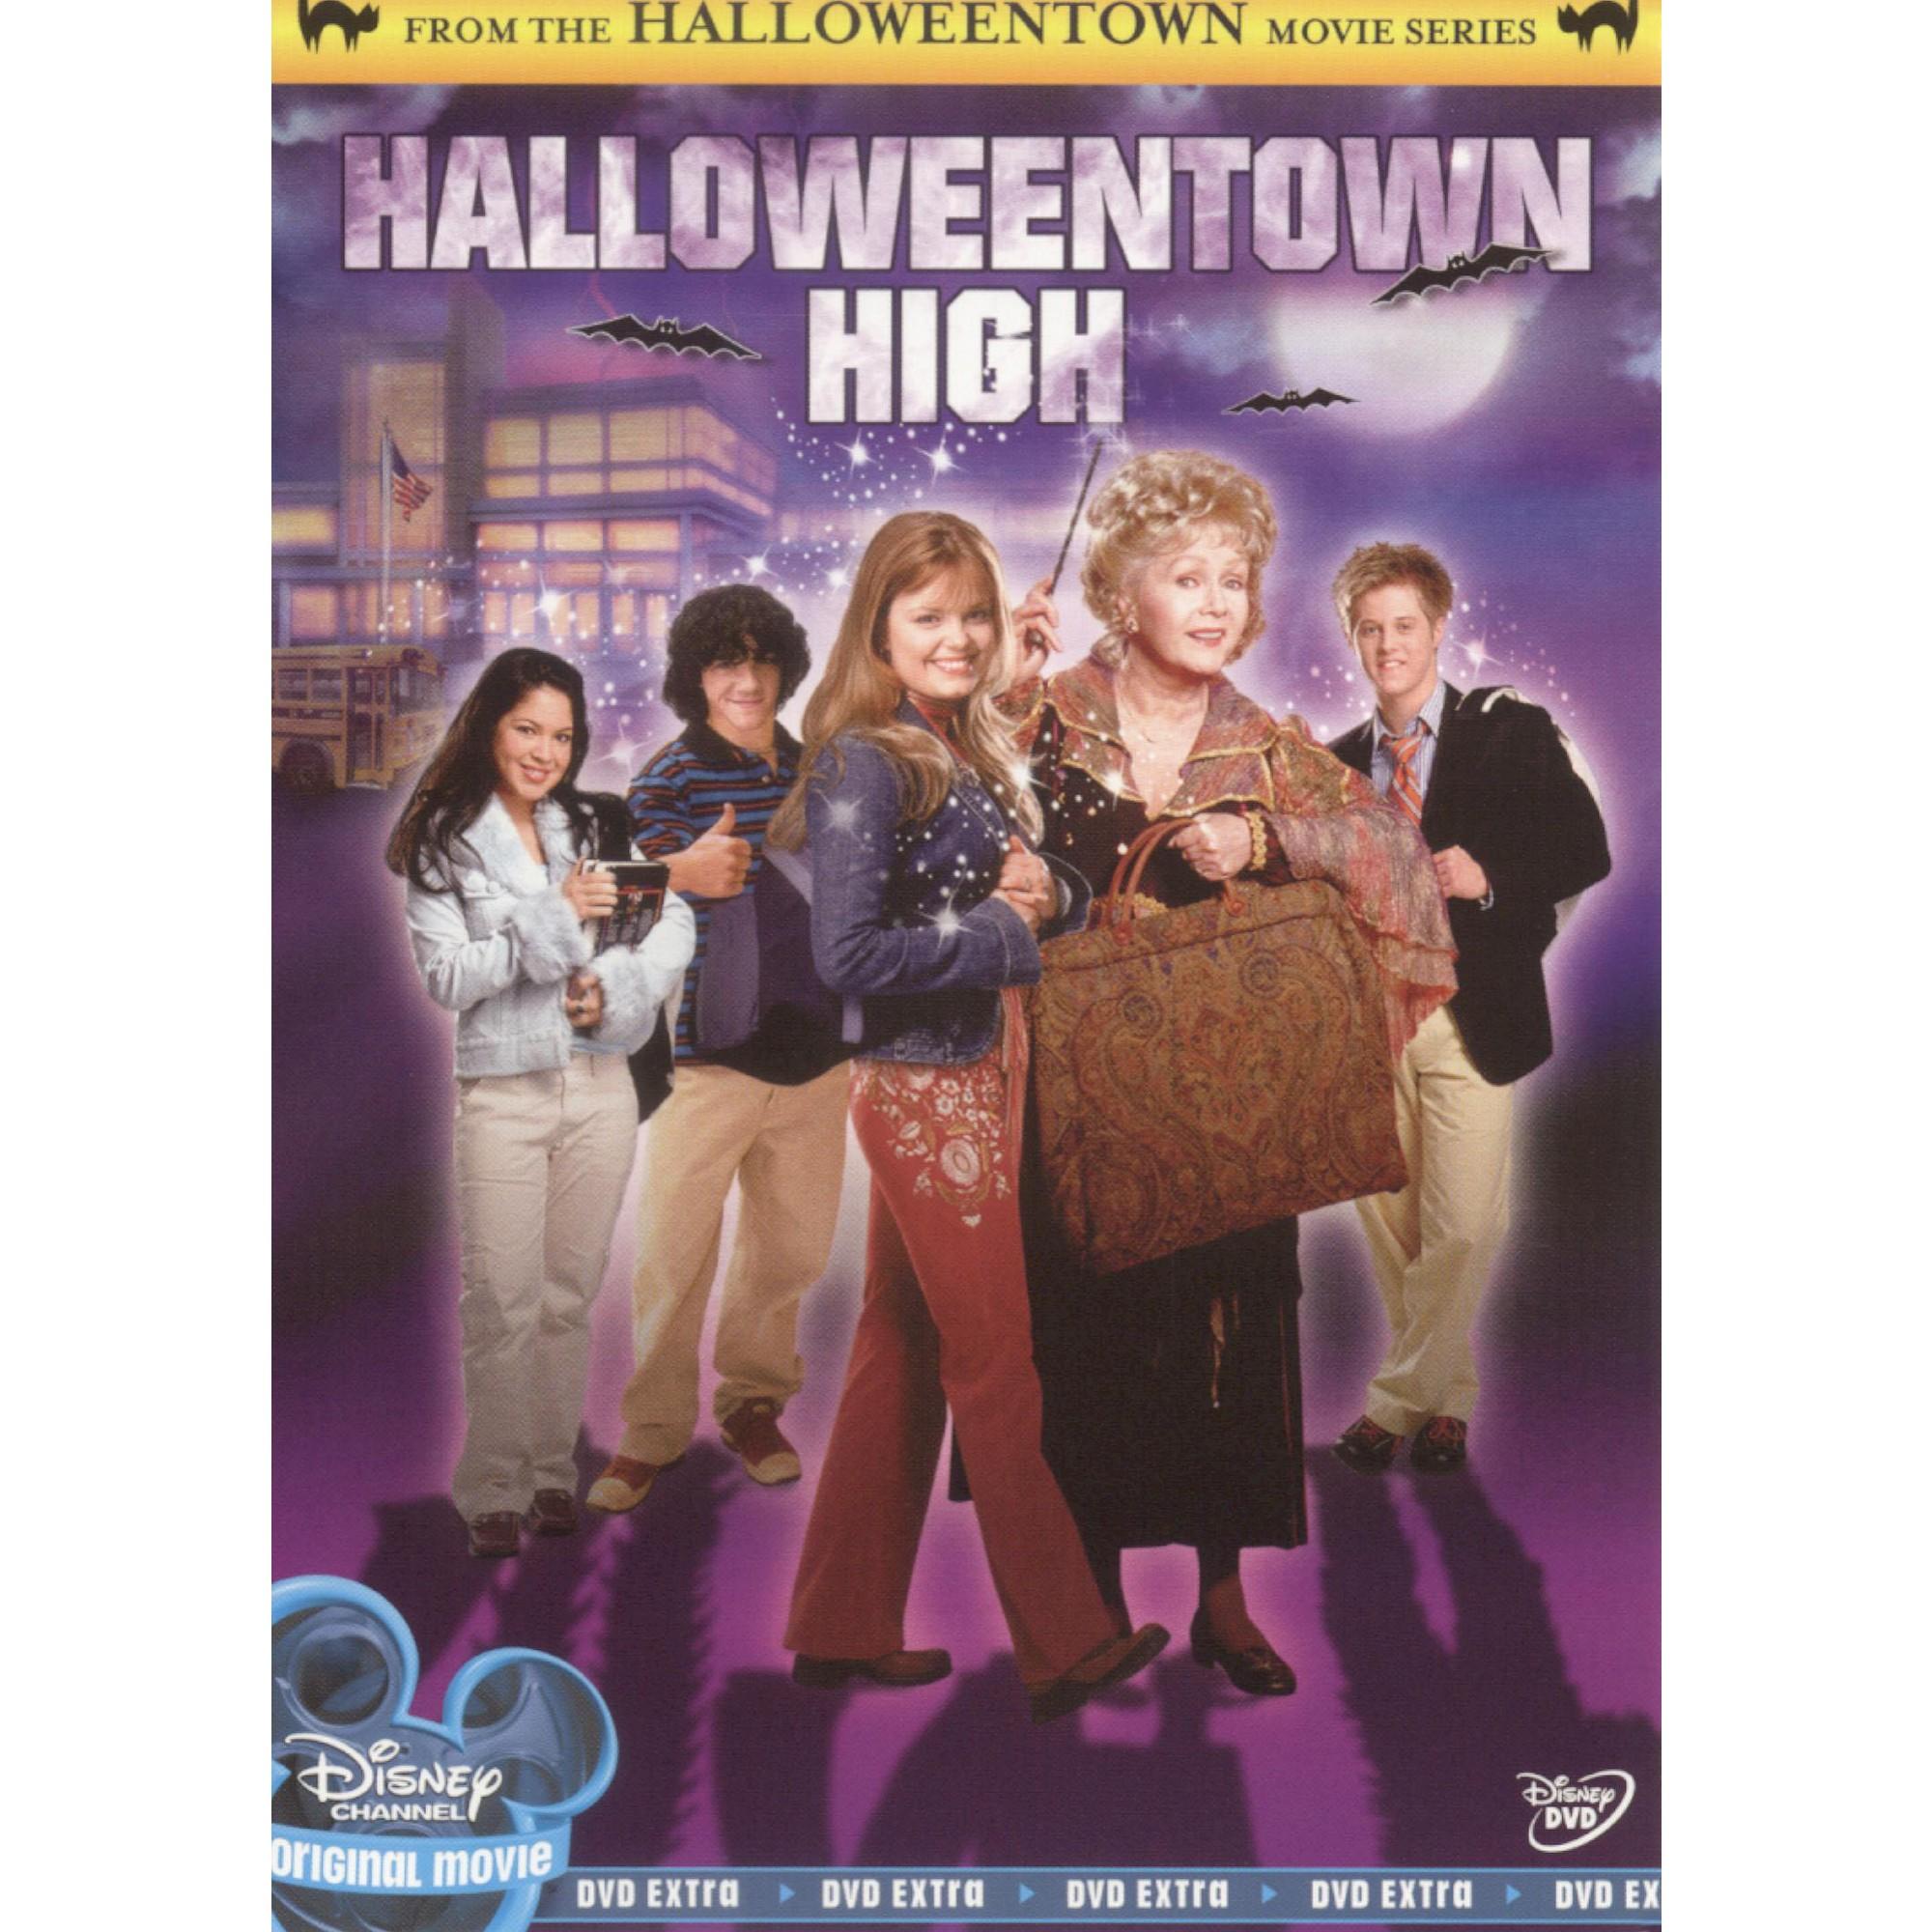 Halloweentown kalabar Download Movies and TV Series on